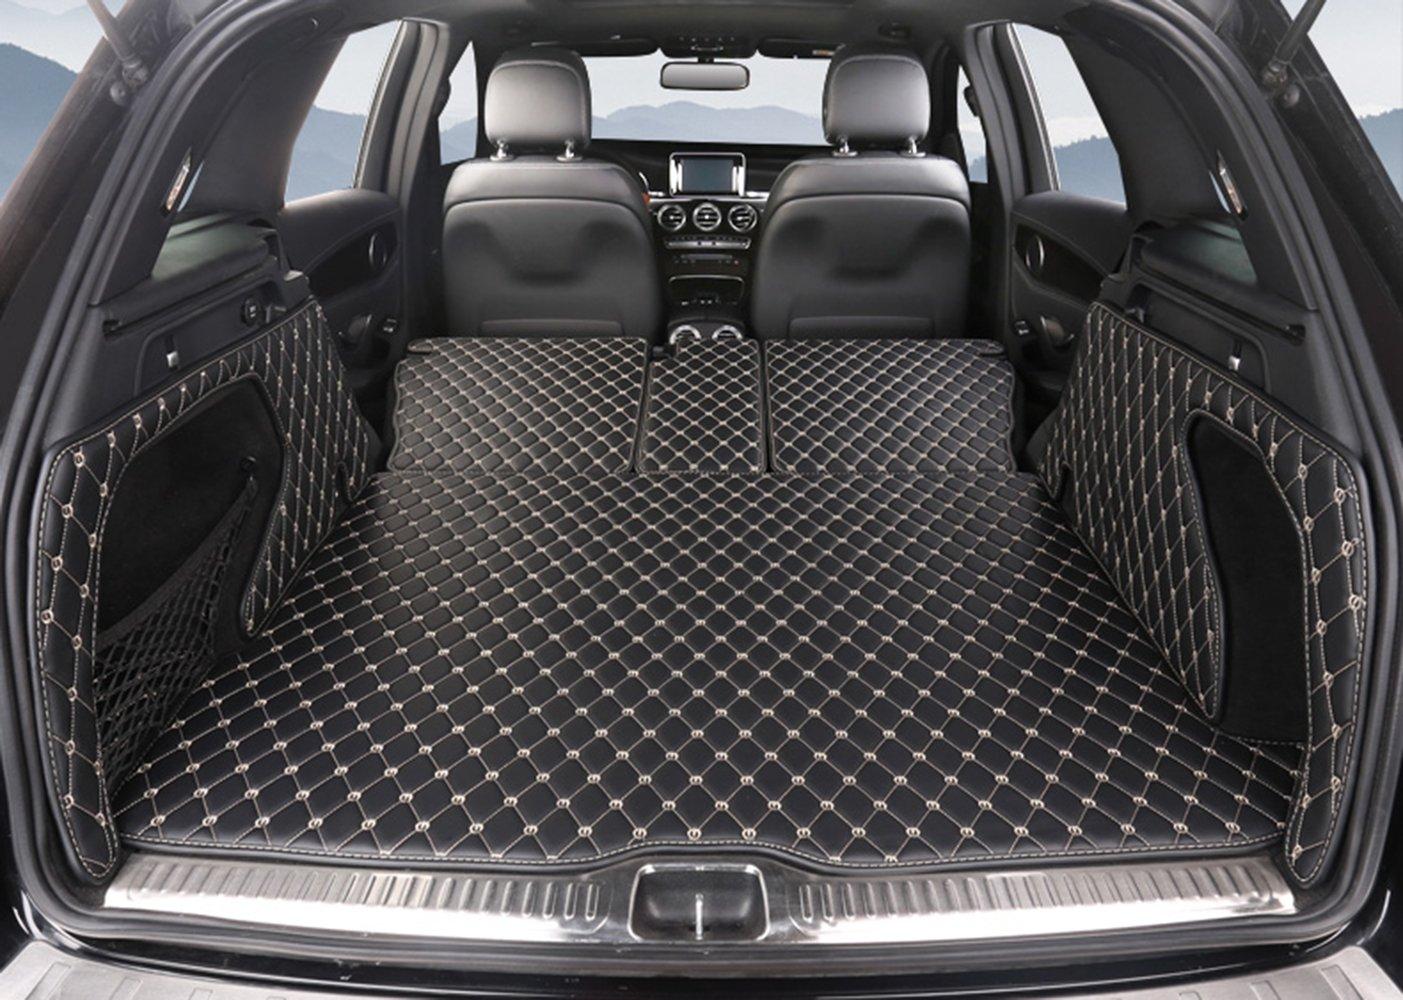 Pegasuss(ペガサス)【メルセデスGLC/Mercedes GLC】専用設計車のトランクマットラゲッジマット防水 - ブラック B01D02TMP8  ブラック